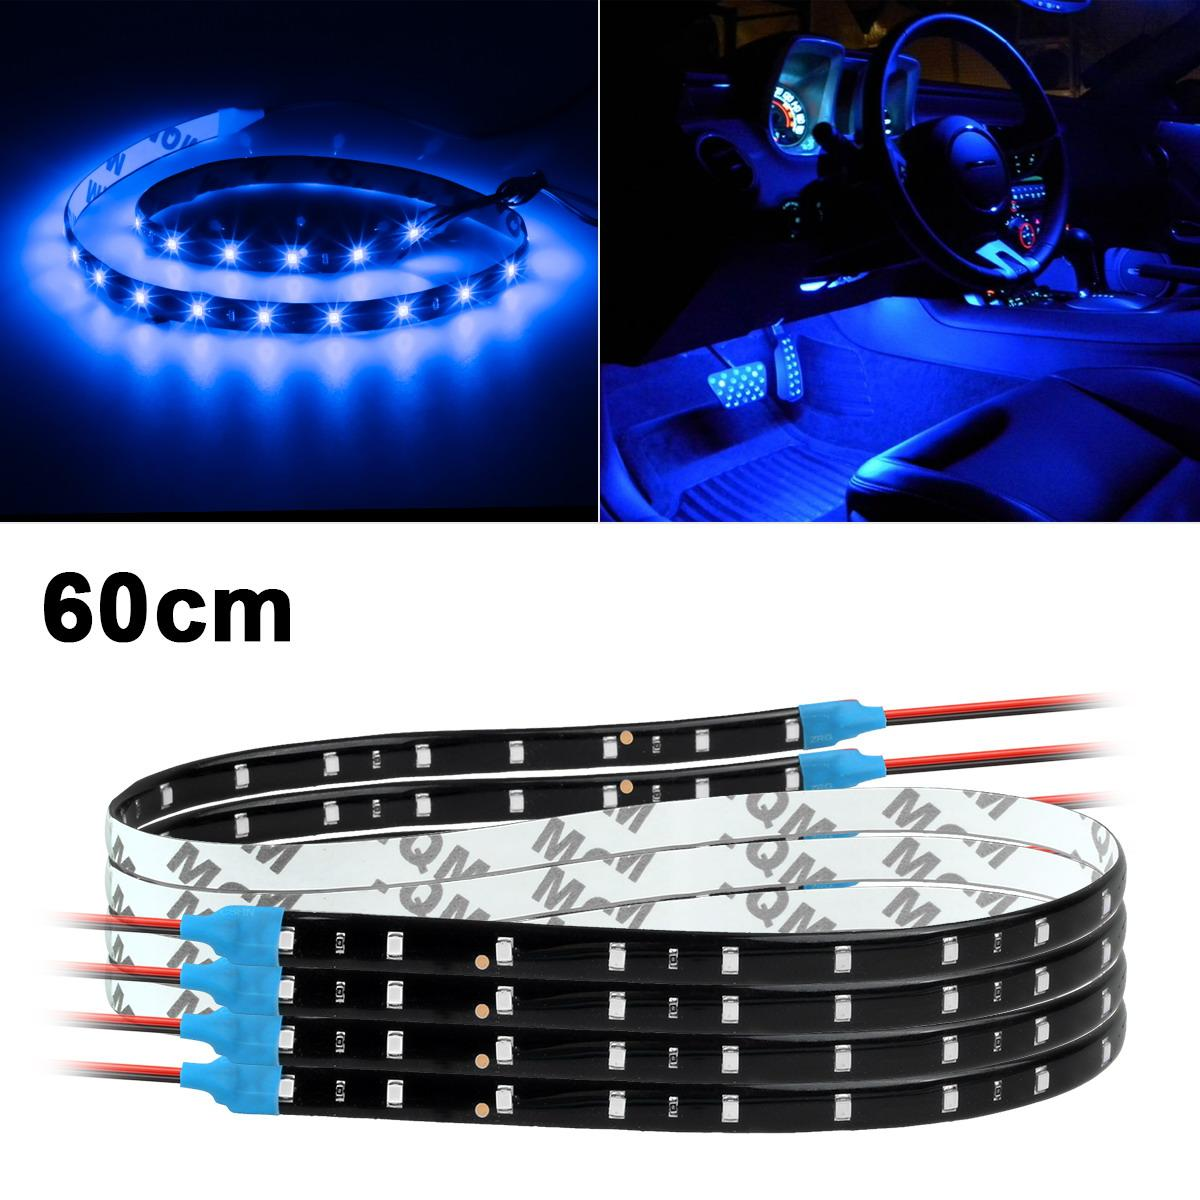 4x 60cm 24 blue 3528 30smd bright flexible led car strips interior door light ebay. Black Bedroom Furniture Sets. Home Design Ideas